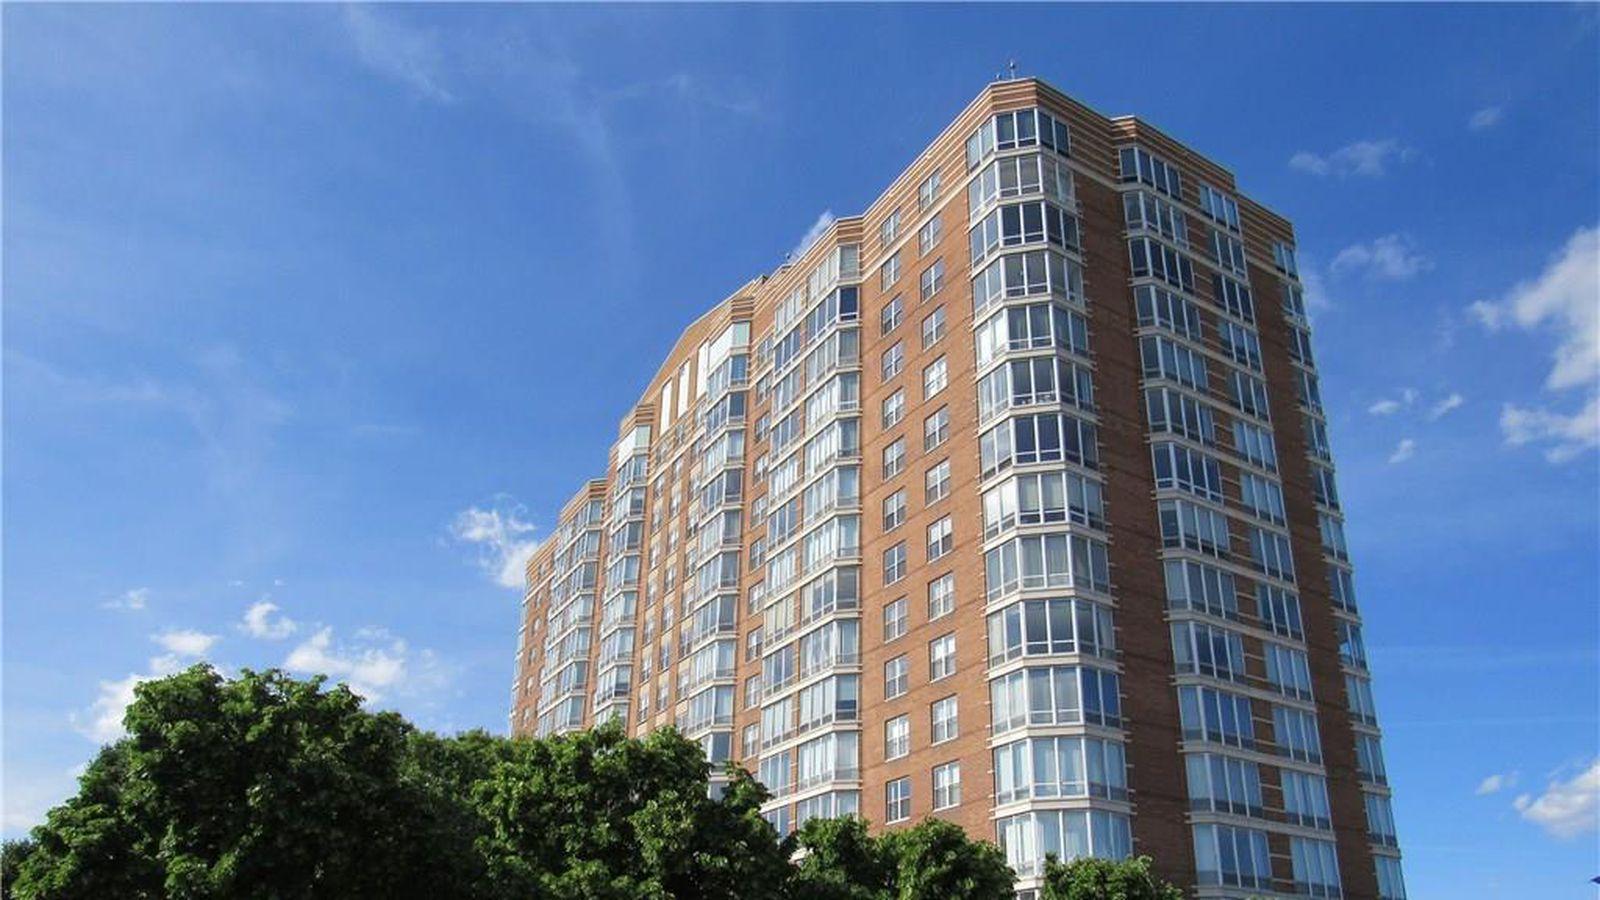 13th floor harbortown condo asks 2 500 a month curbed for 13th floor philadelphia